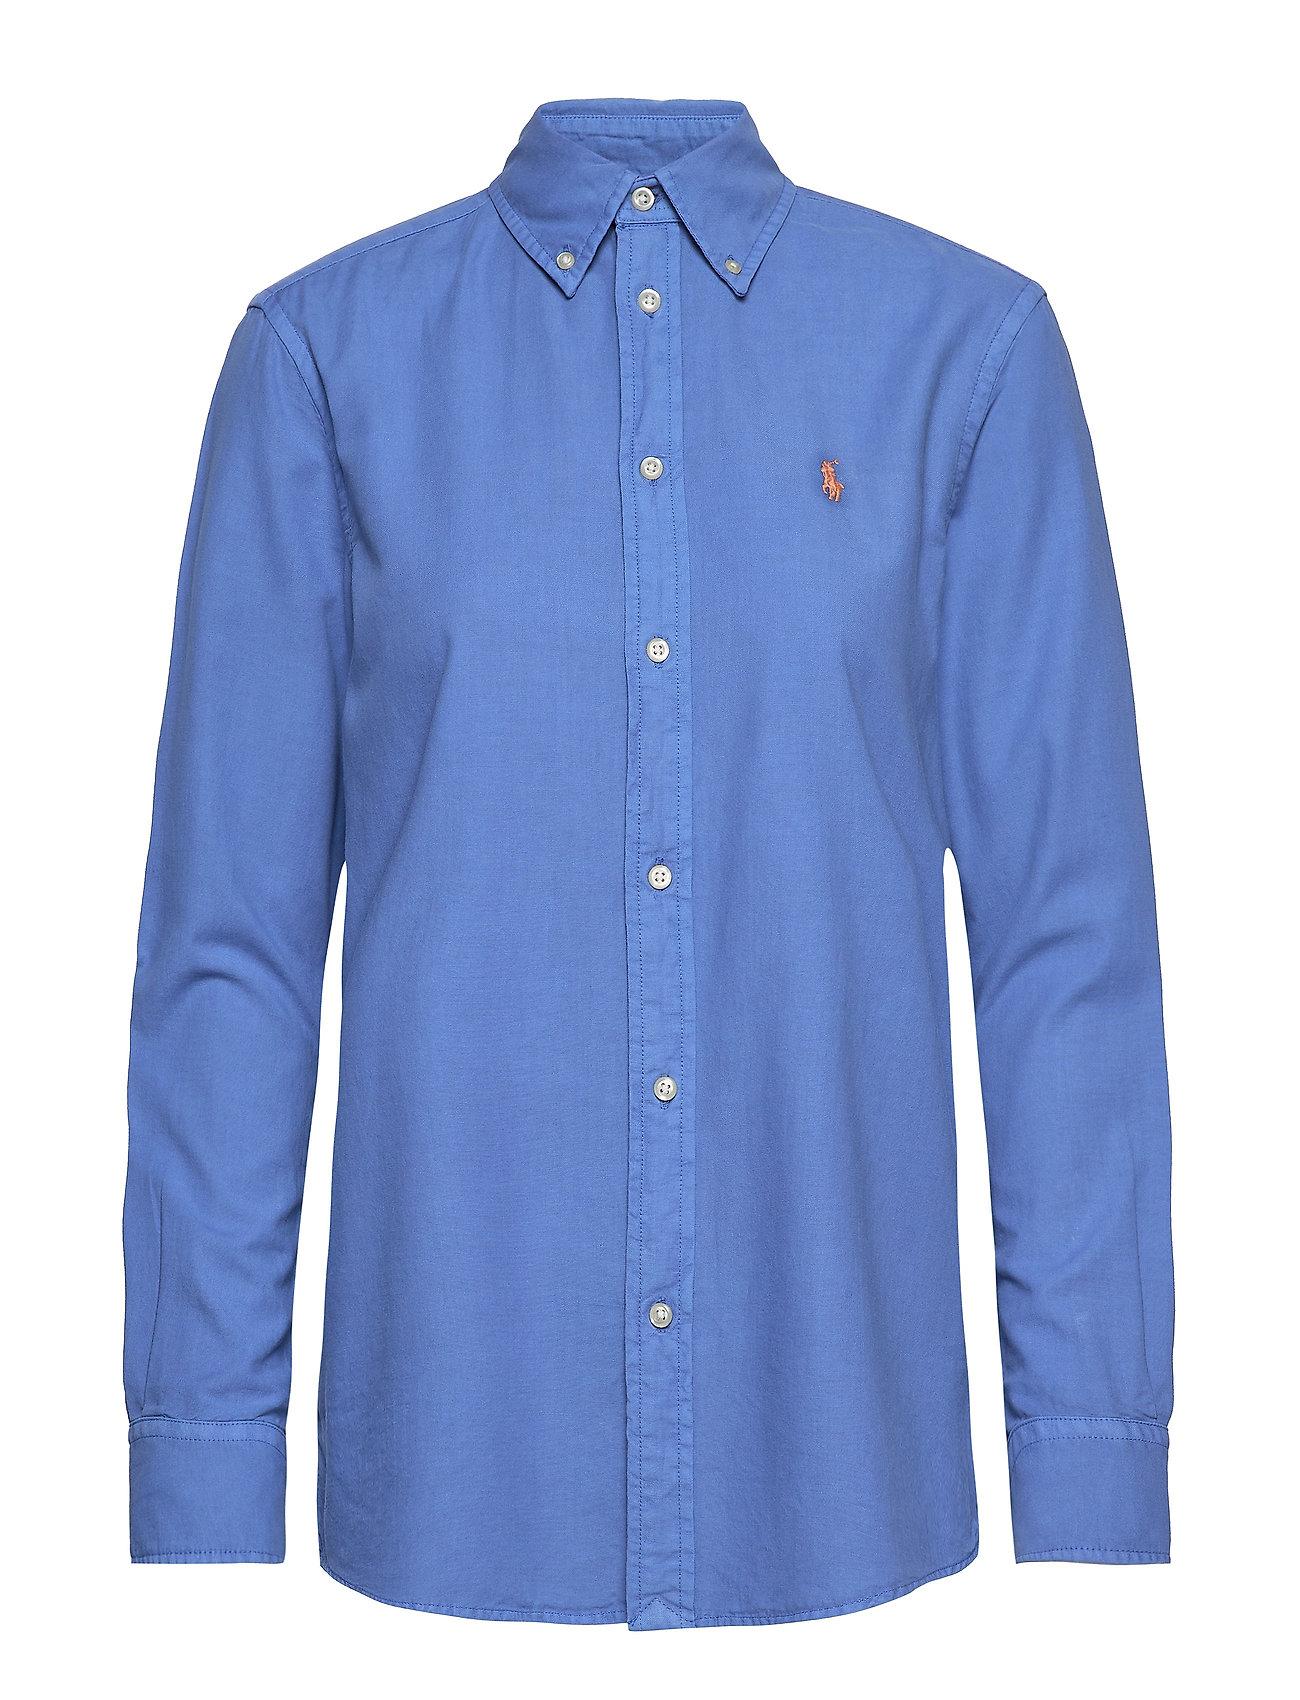 Polo Ralph Lauren GD LT WT OXFORD-LSL-SHT - COLBY BLUE